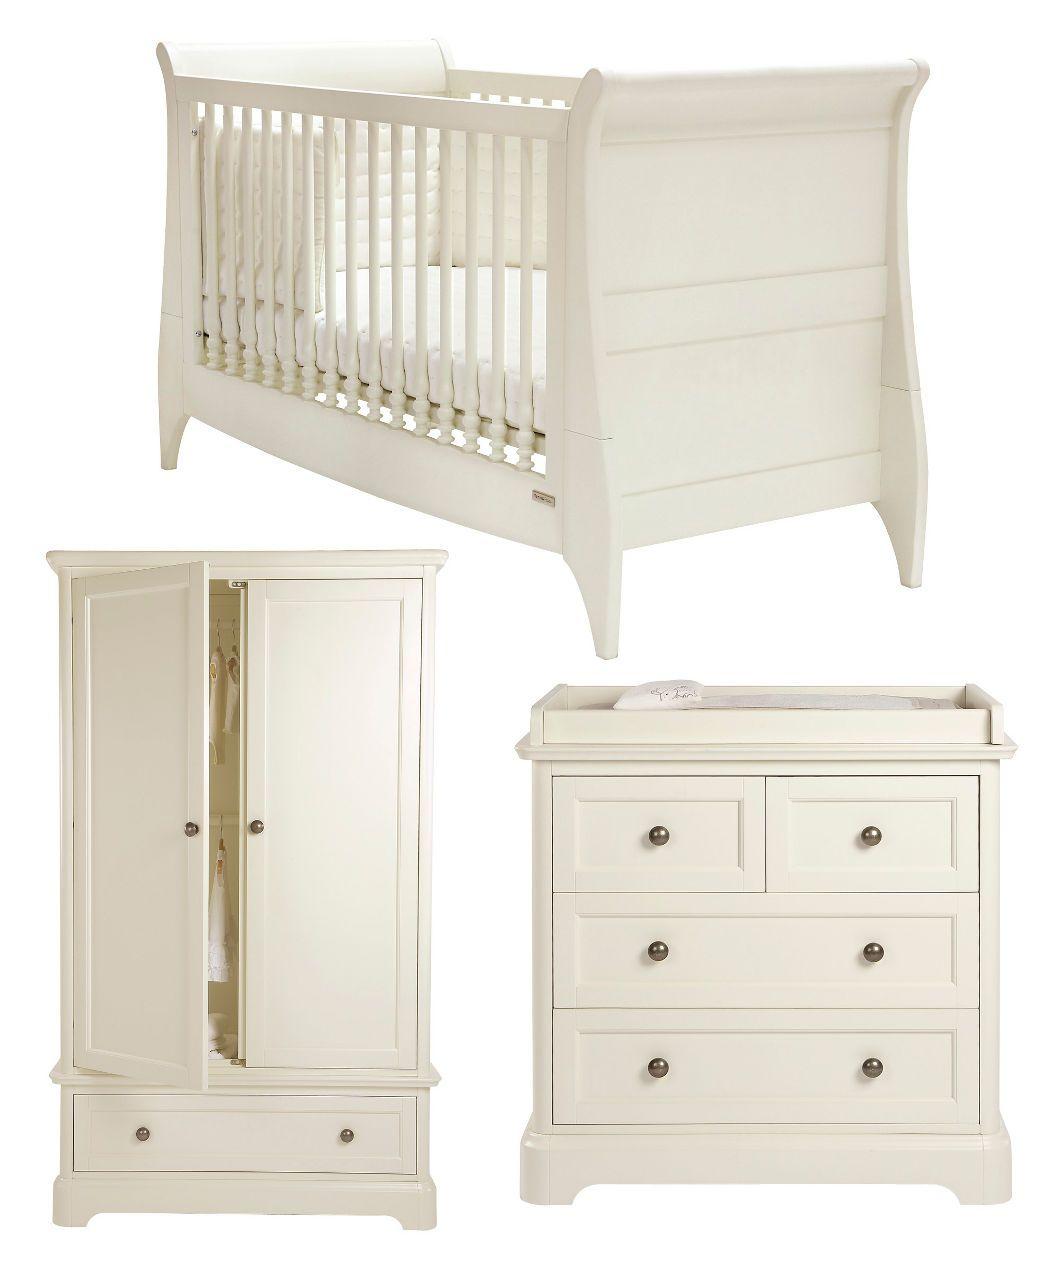 Orchard 3 Piece Set Orchard Mamas Papas Baby Outfits Newborn Newborn Room Nursery Furniture